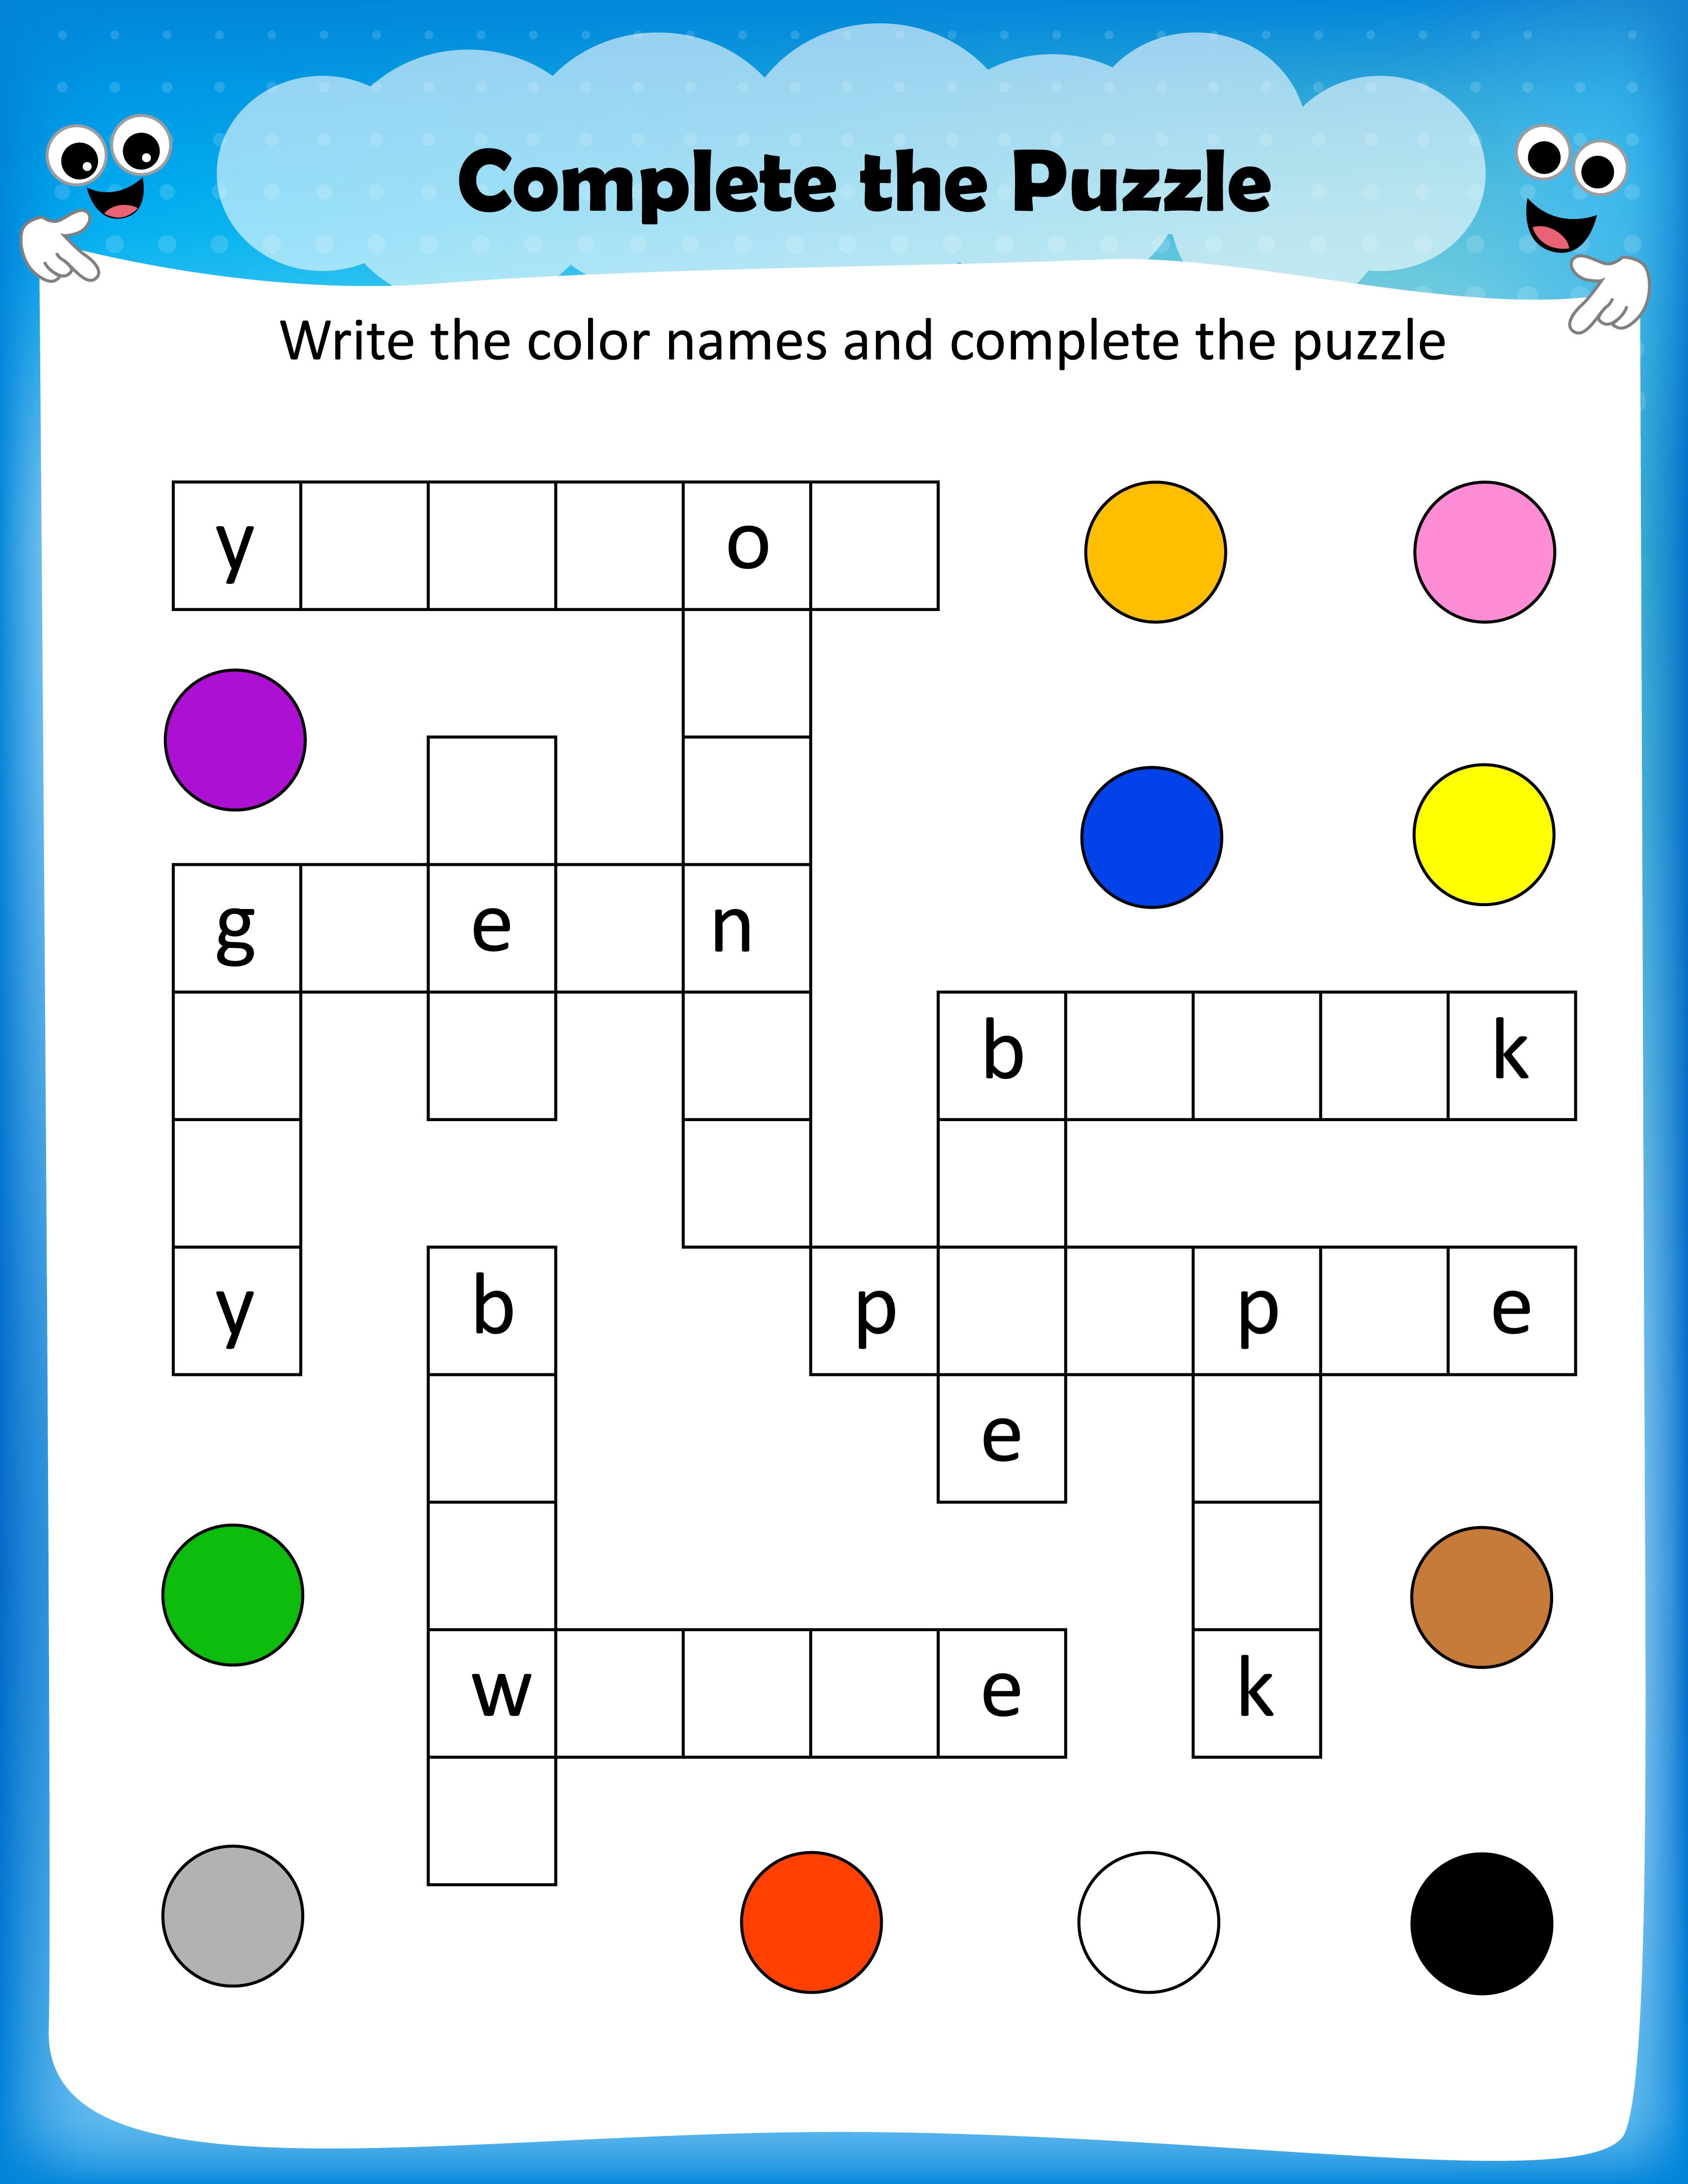 Nhl Crossword Puzzle Printable Crosswords All - Free Printable - Crossword Puzzles For Kindergarten Free Printable